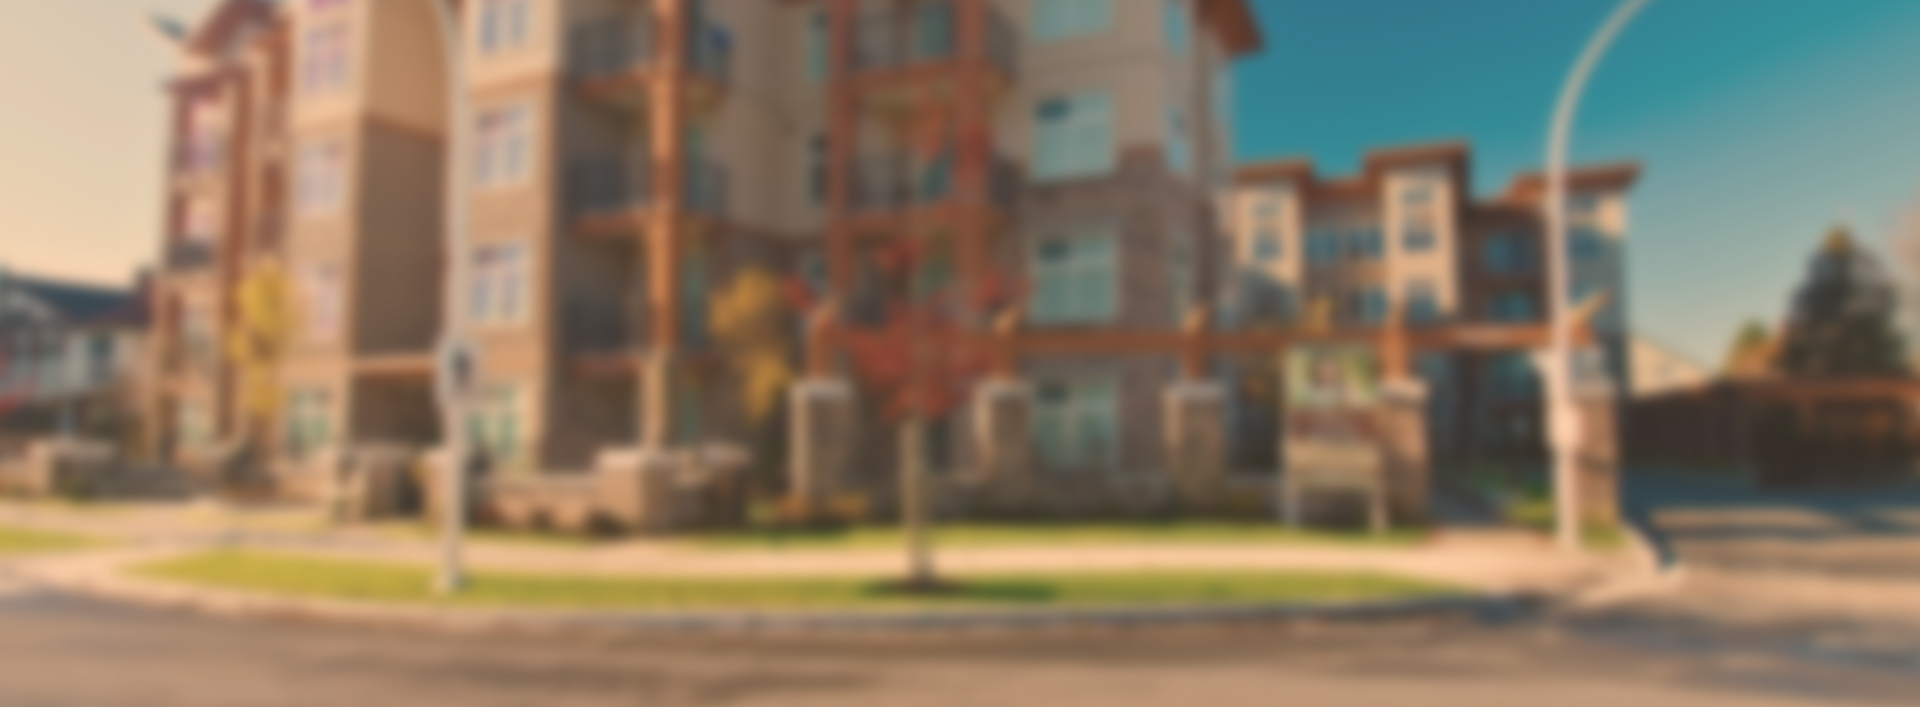 blur image one